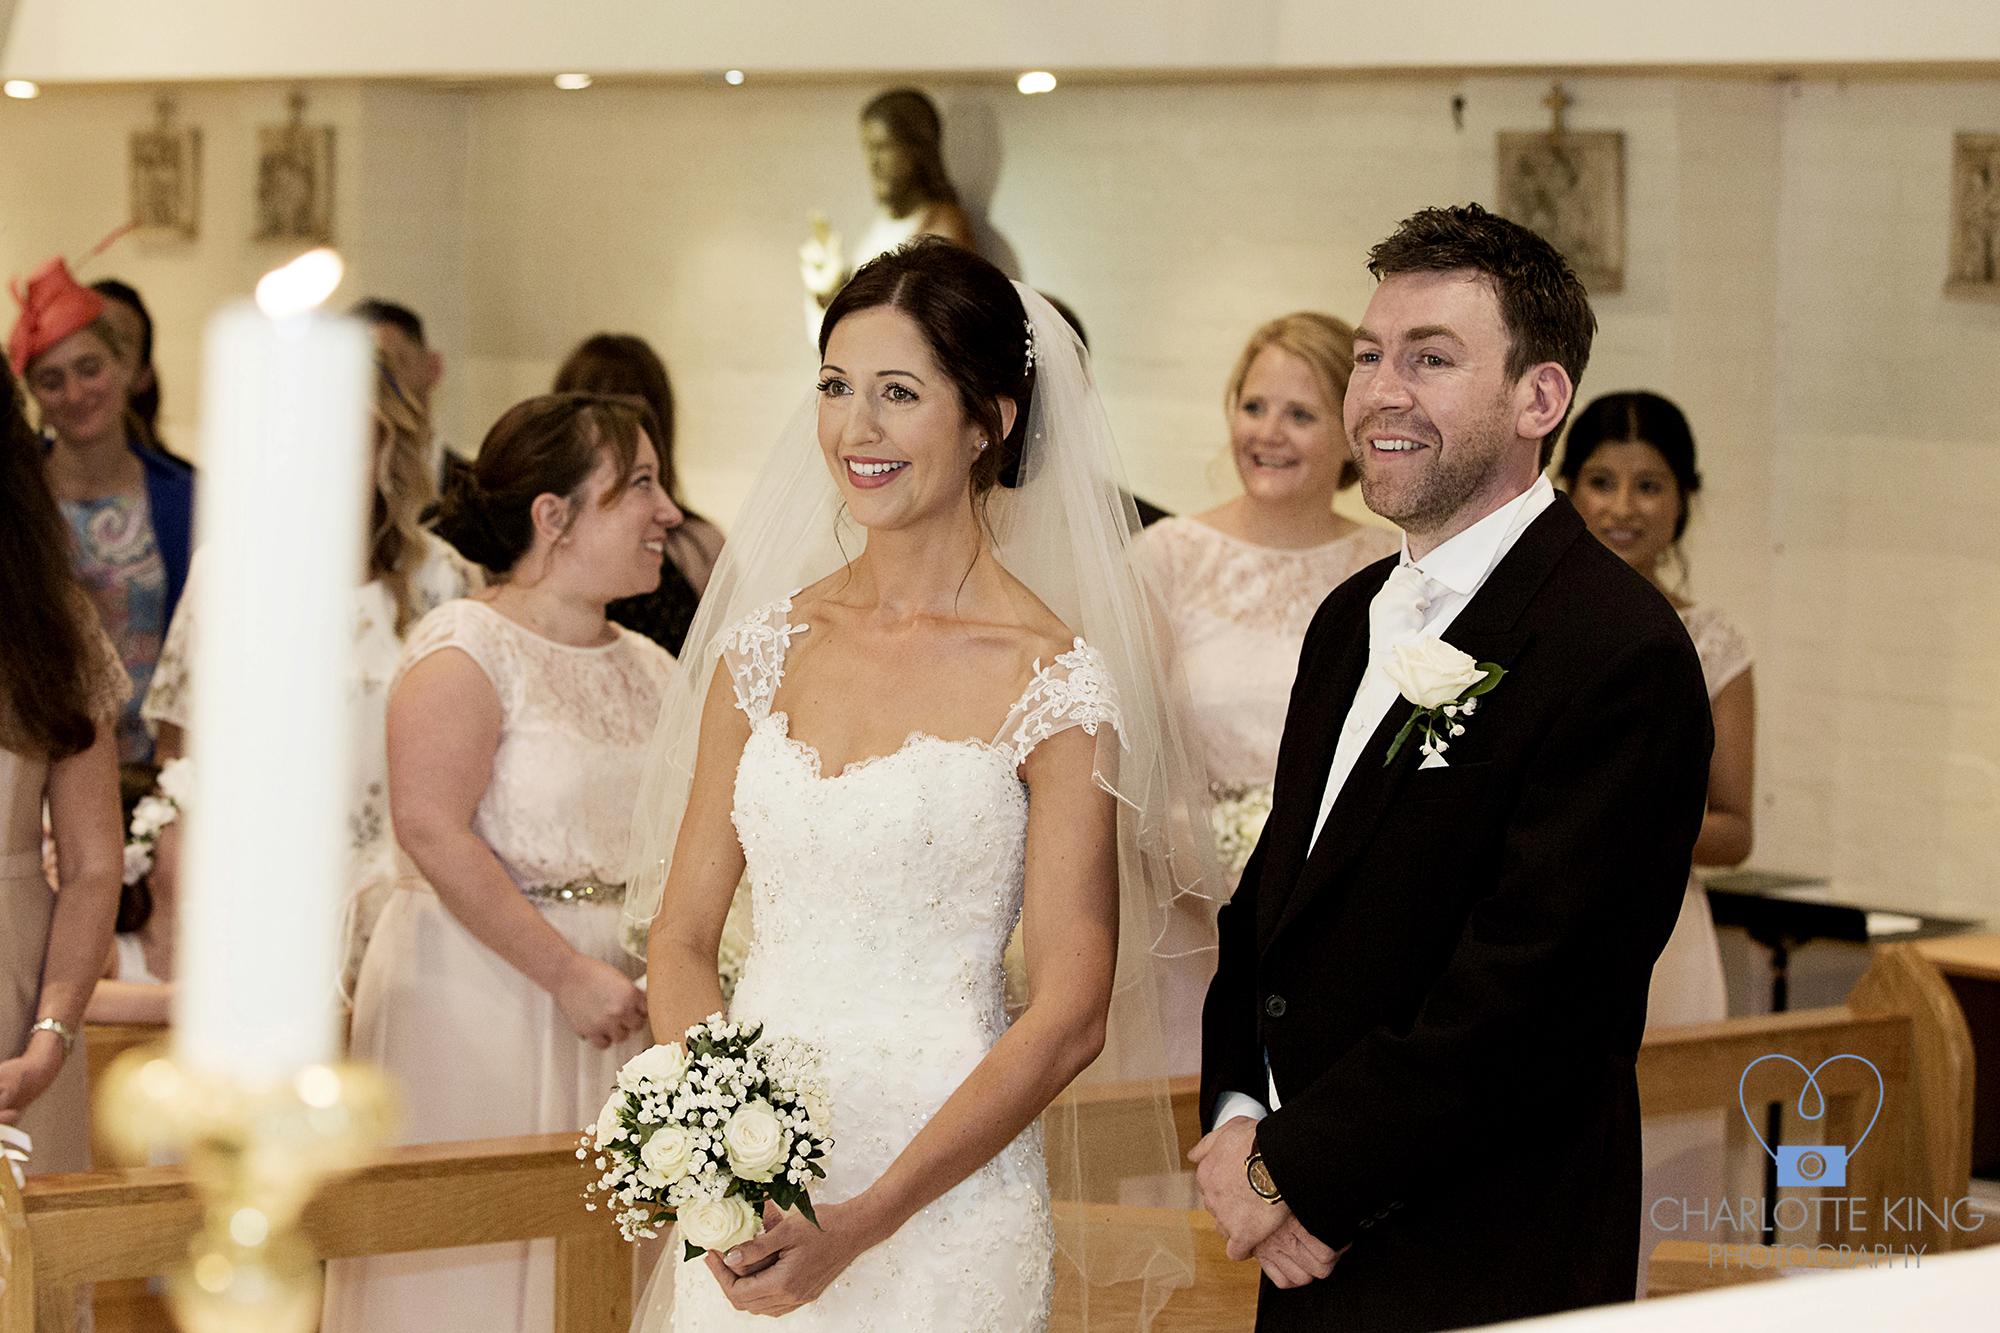 Woldingham-school-wedding-charlotte-king-photography (55)